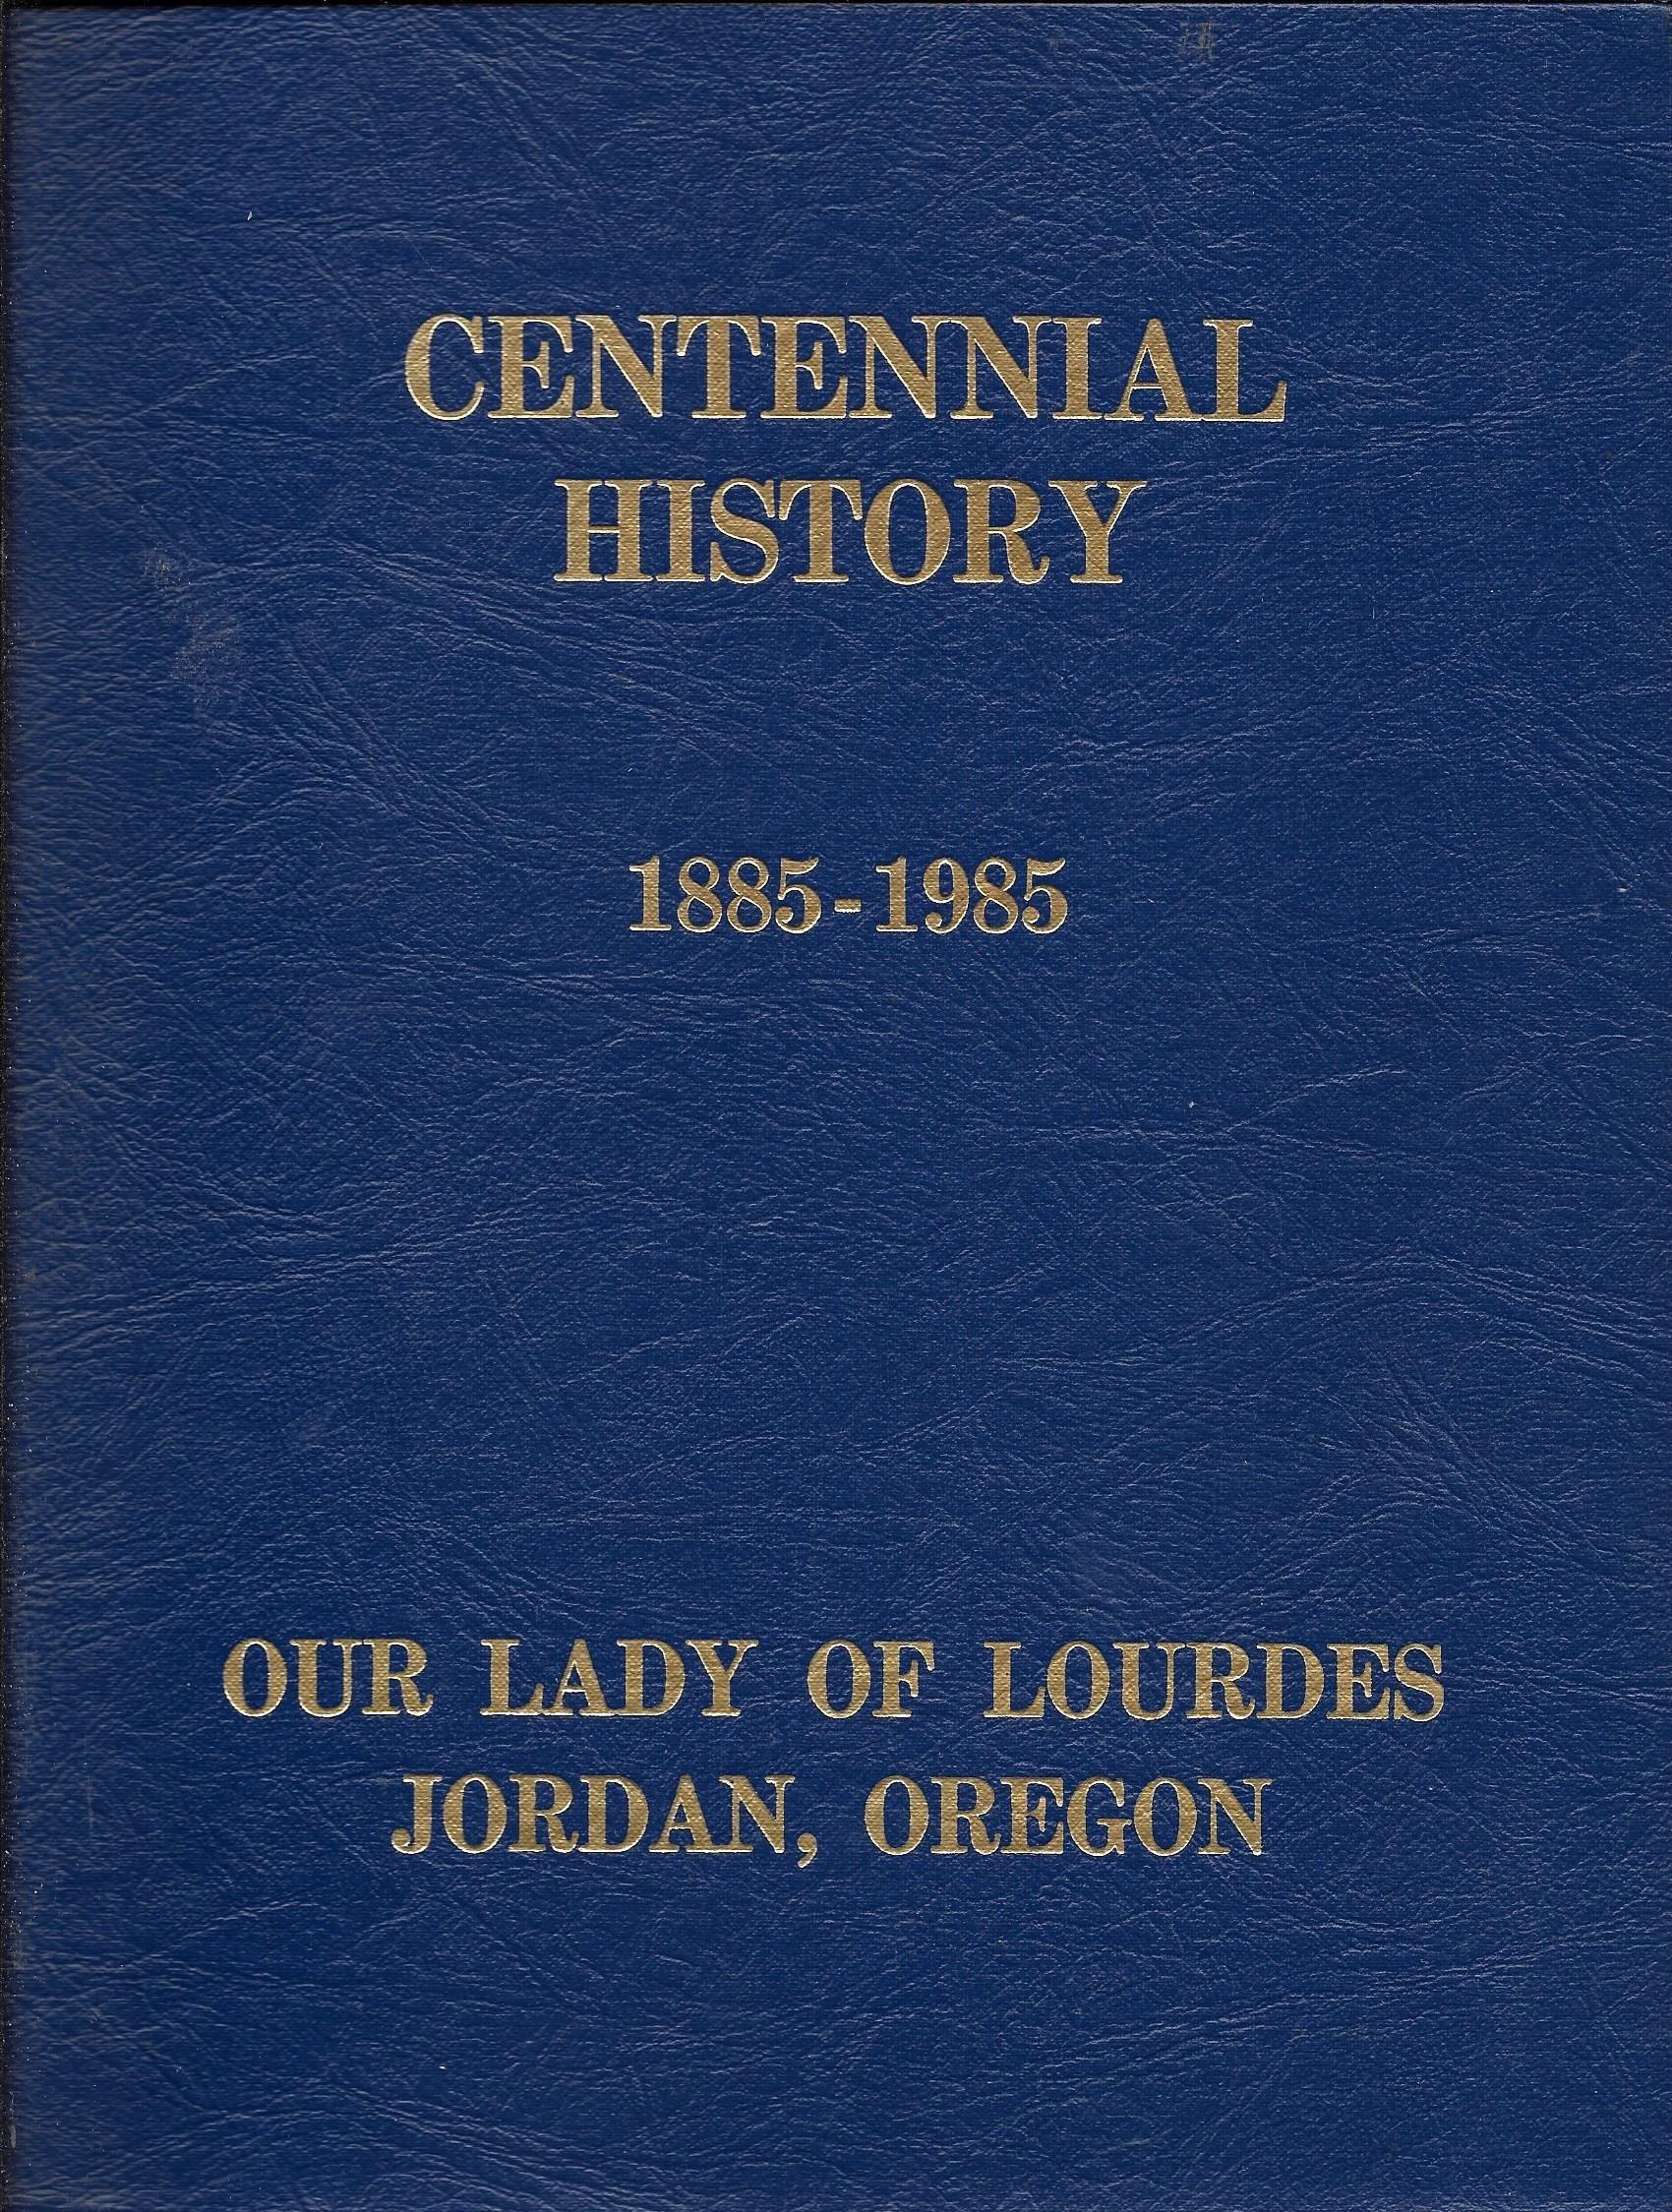 Centennial History 1885-1985 Our Lady of Lourdes Jordan, Oregon